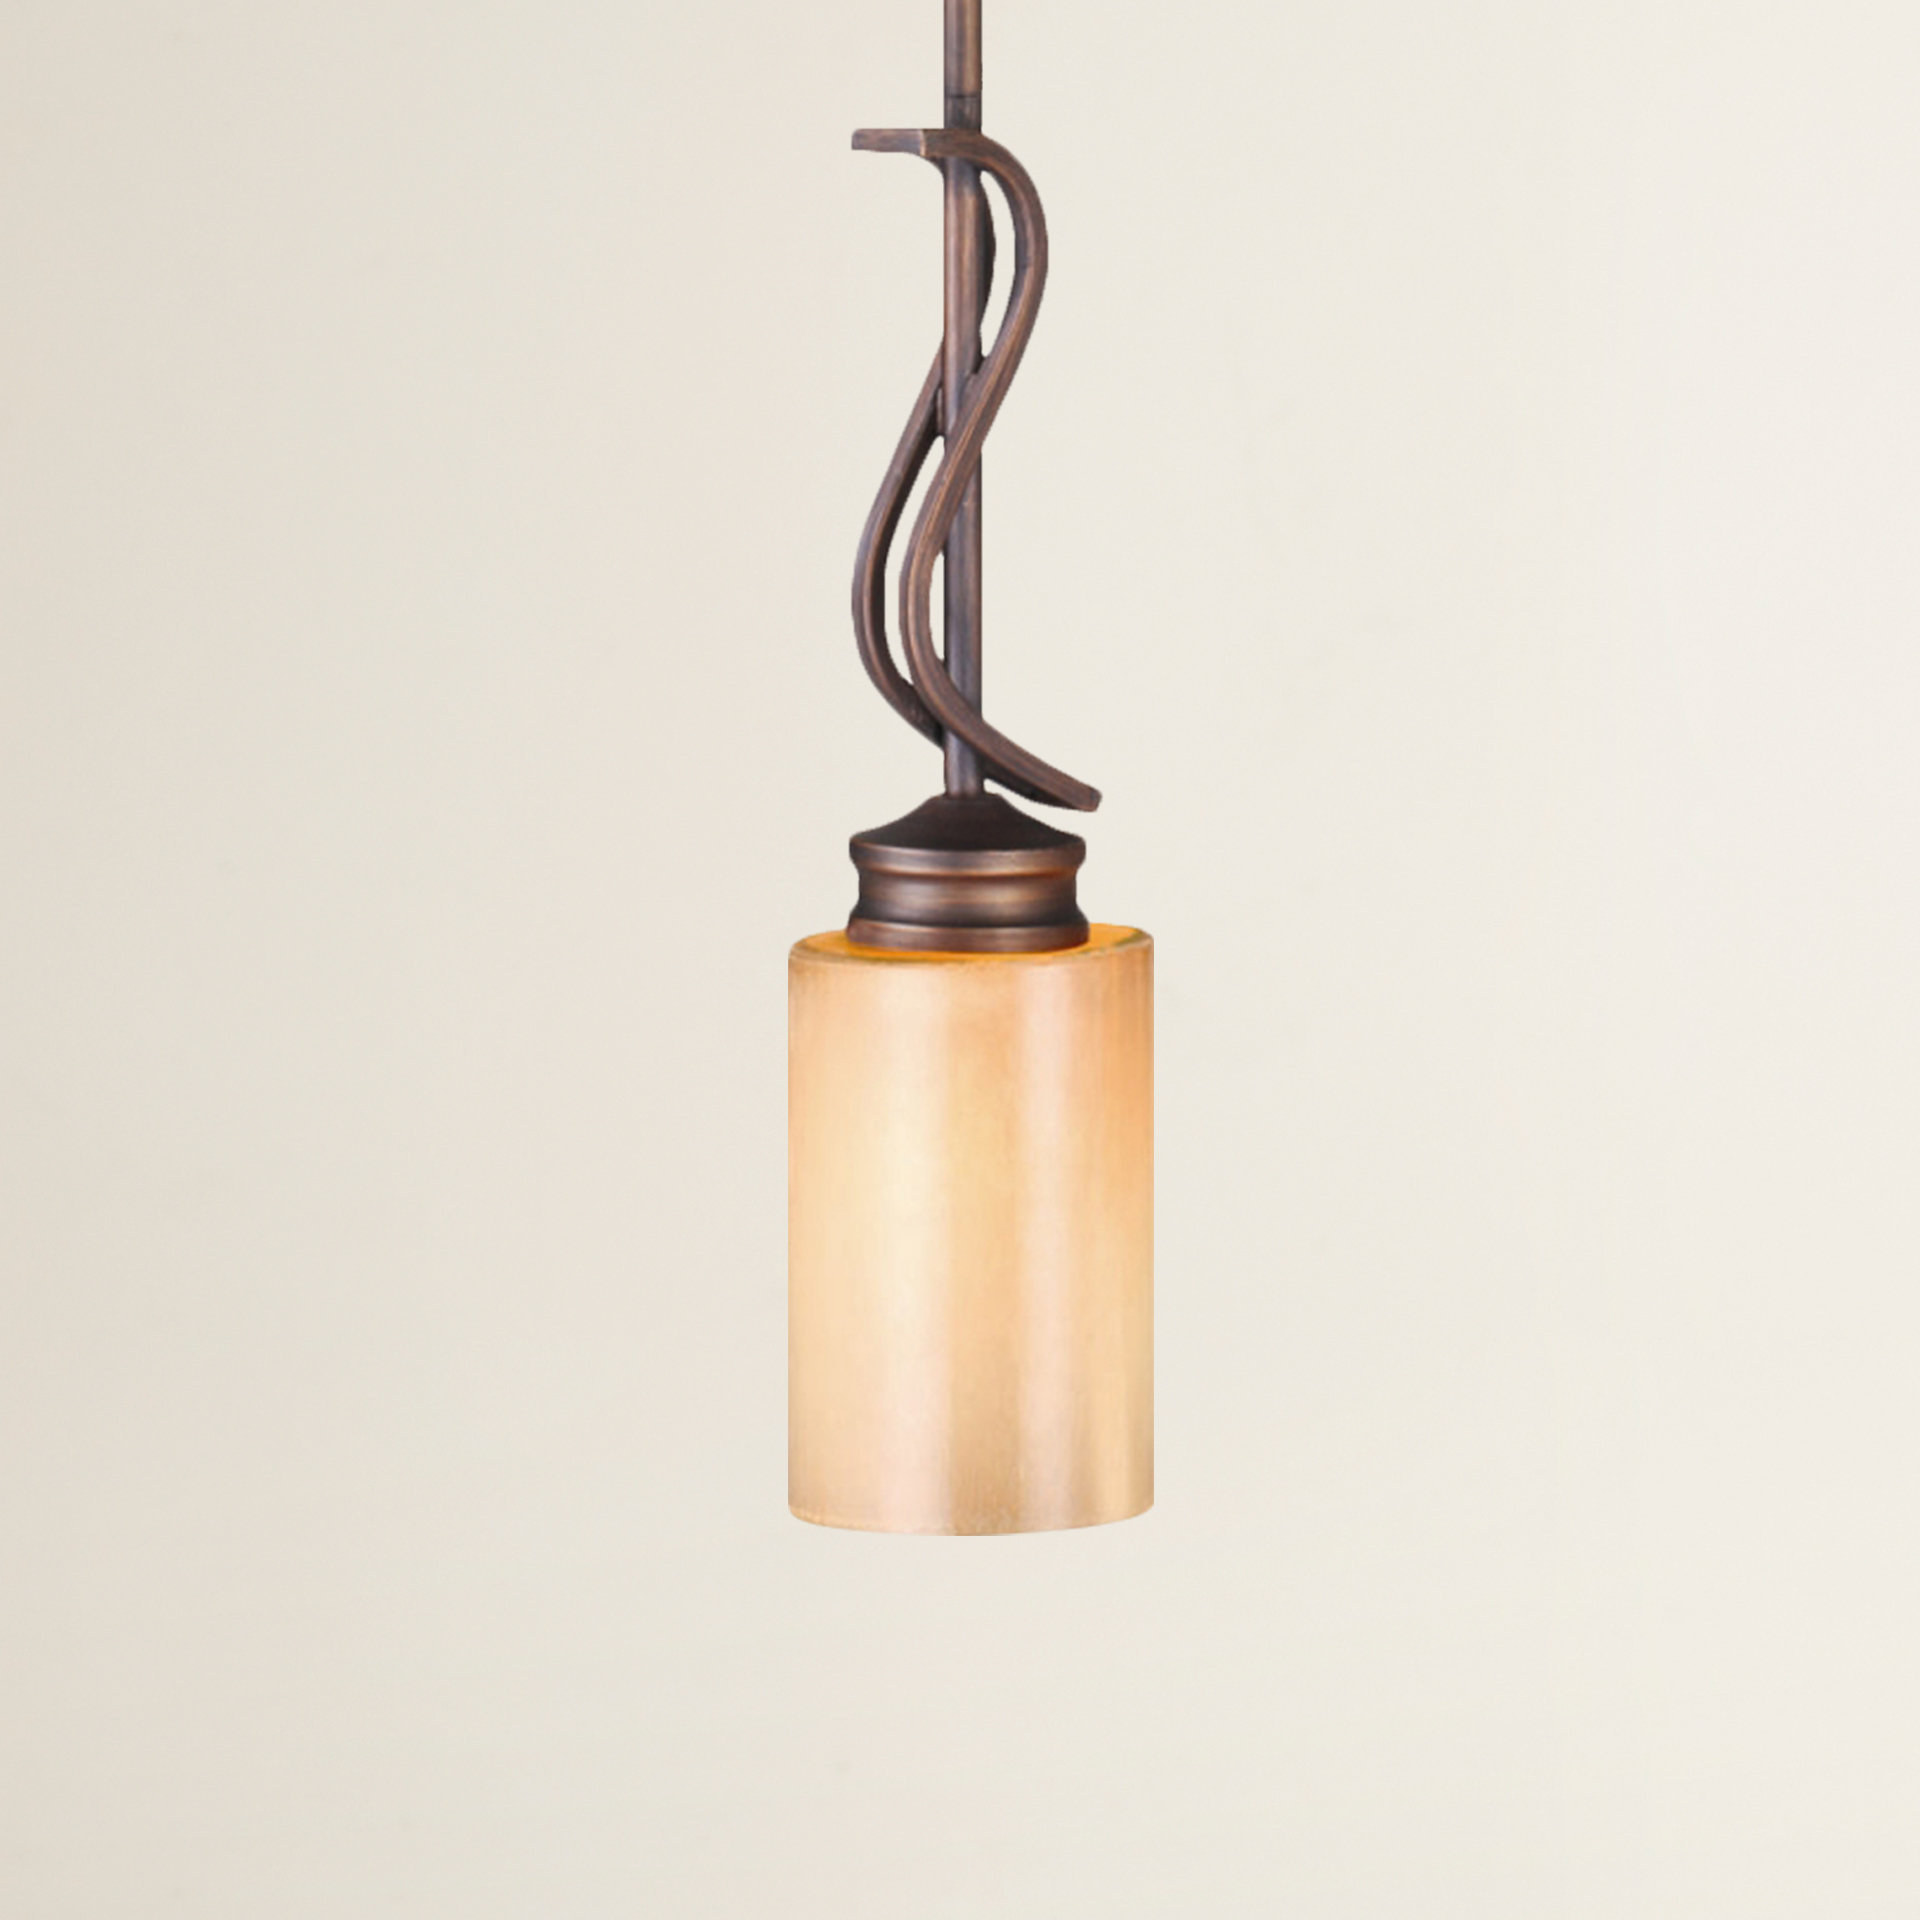 Charlton Home Pendant Lighting You'll Love In 2019 | Wayfair Intended For Robblee 4 Light Geometric Pendants (View 7 of 30)